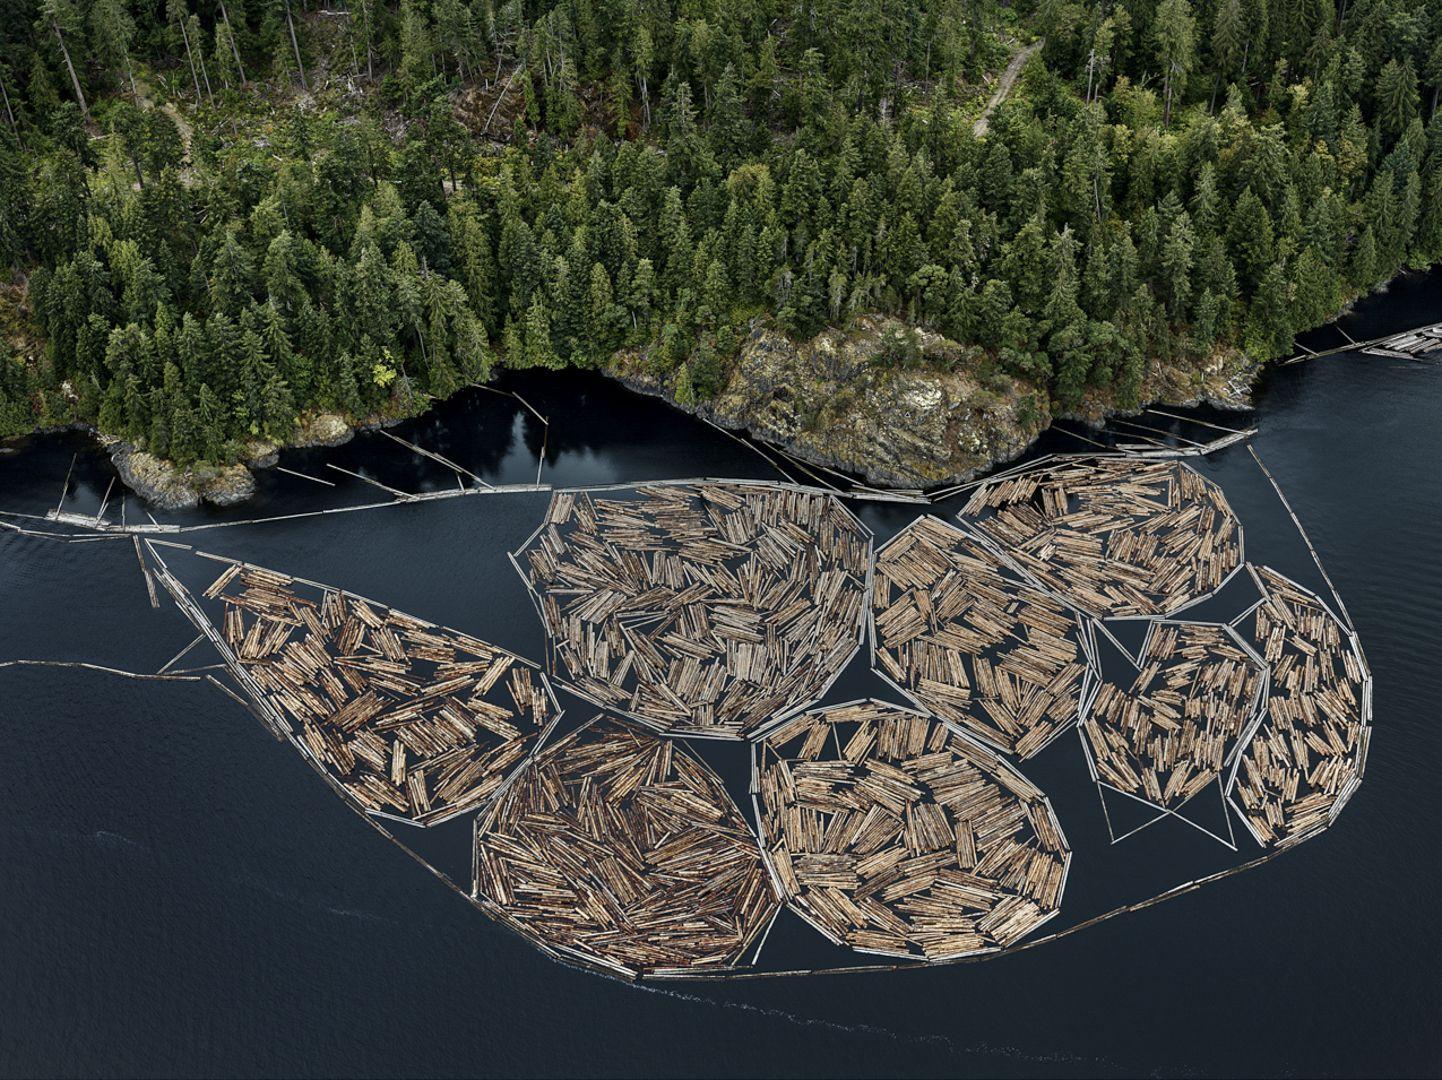 Edward Burtynsky - Log Booms #1, Vancouver Island, British Columbia, Canada 2/6, 2016 - Howard Greenberg Gallery - 2018